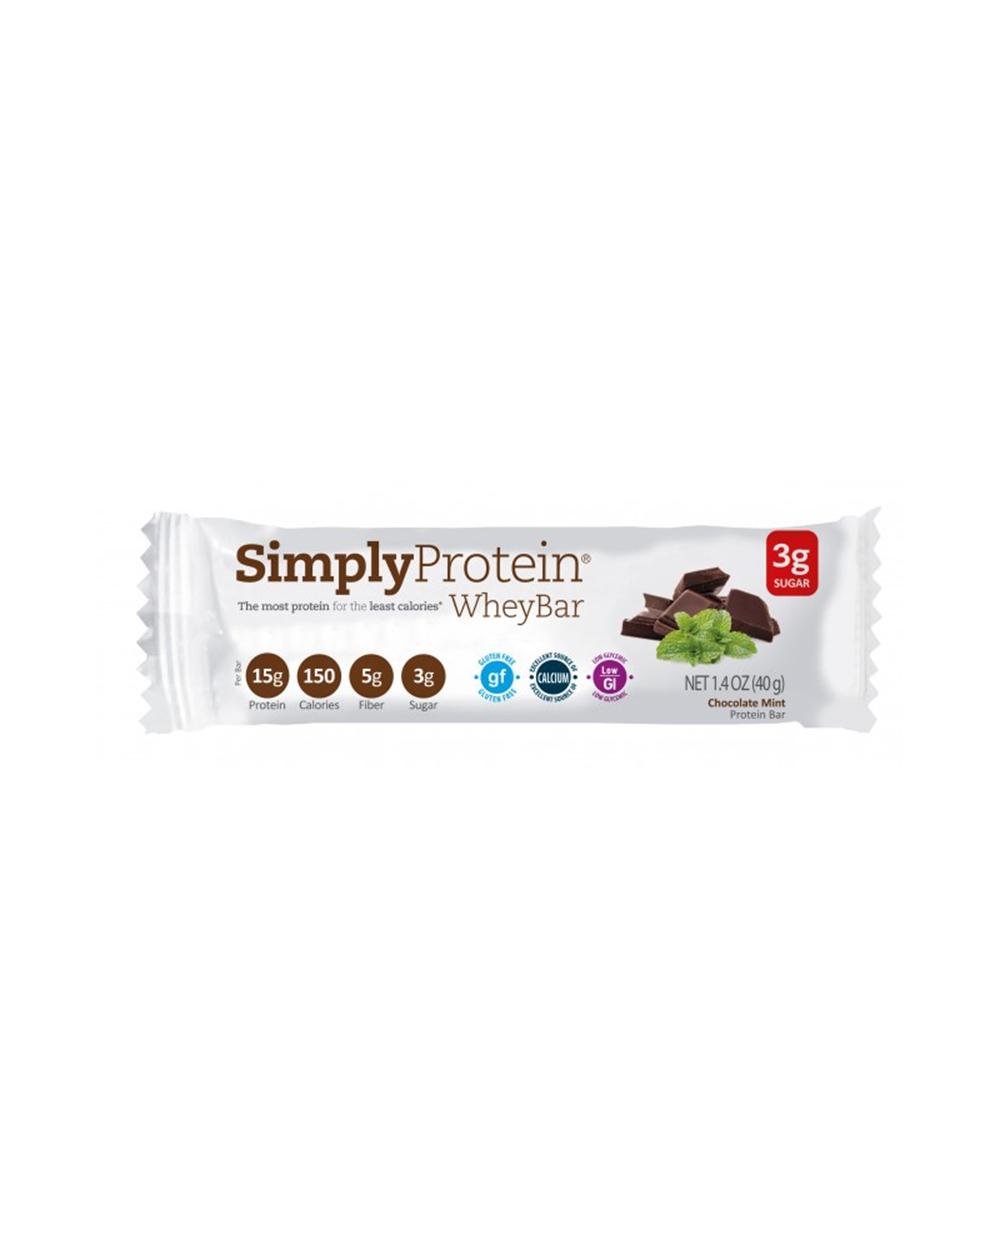 SP-Whey-Chocolate-Mint